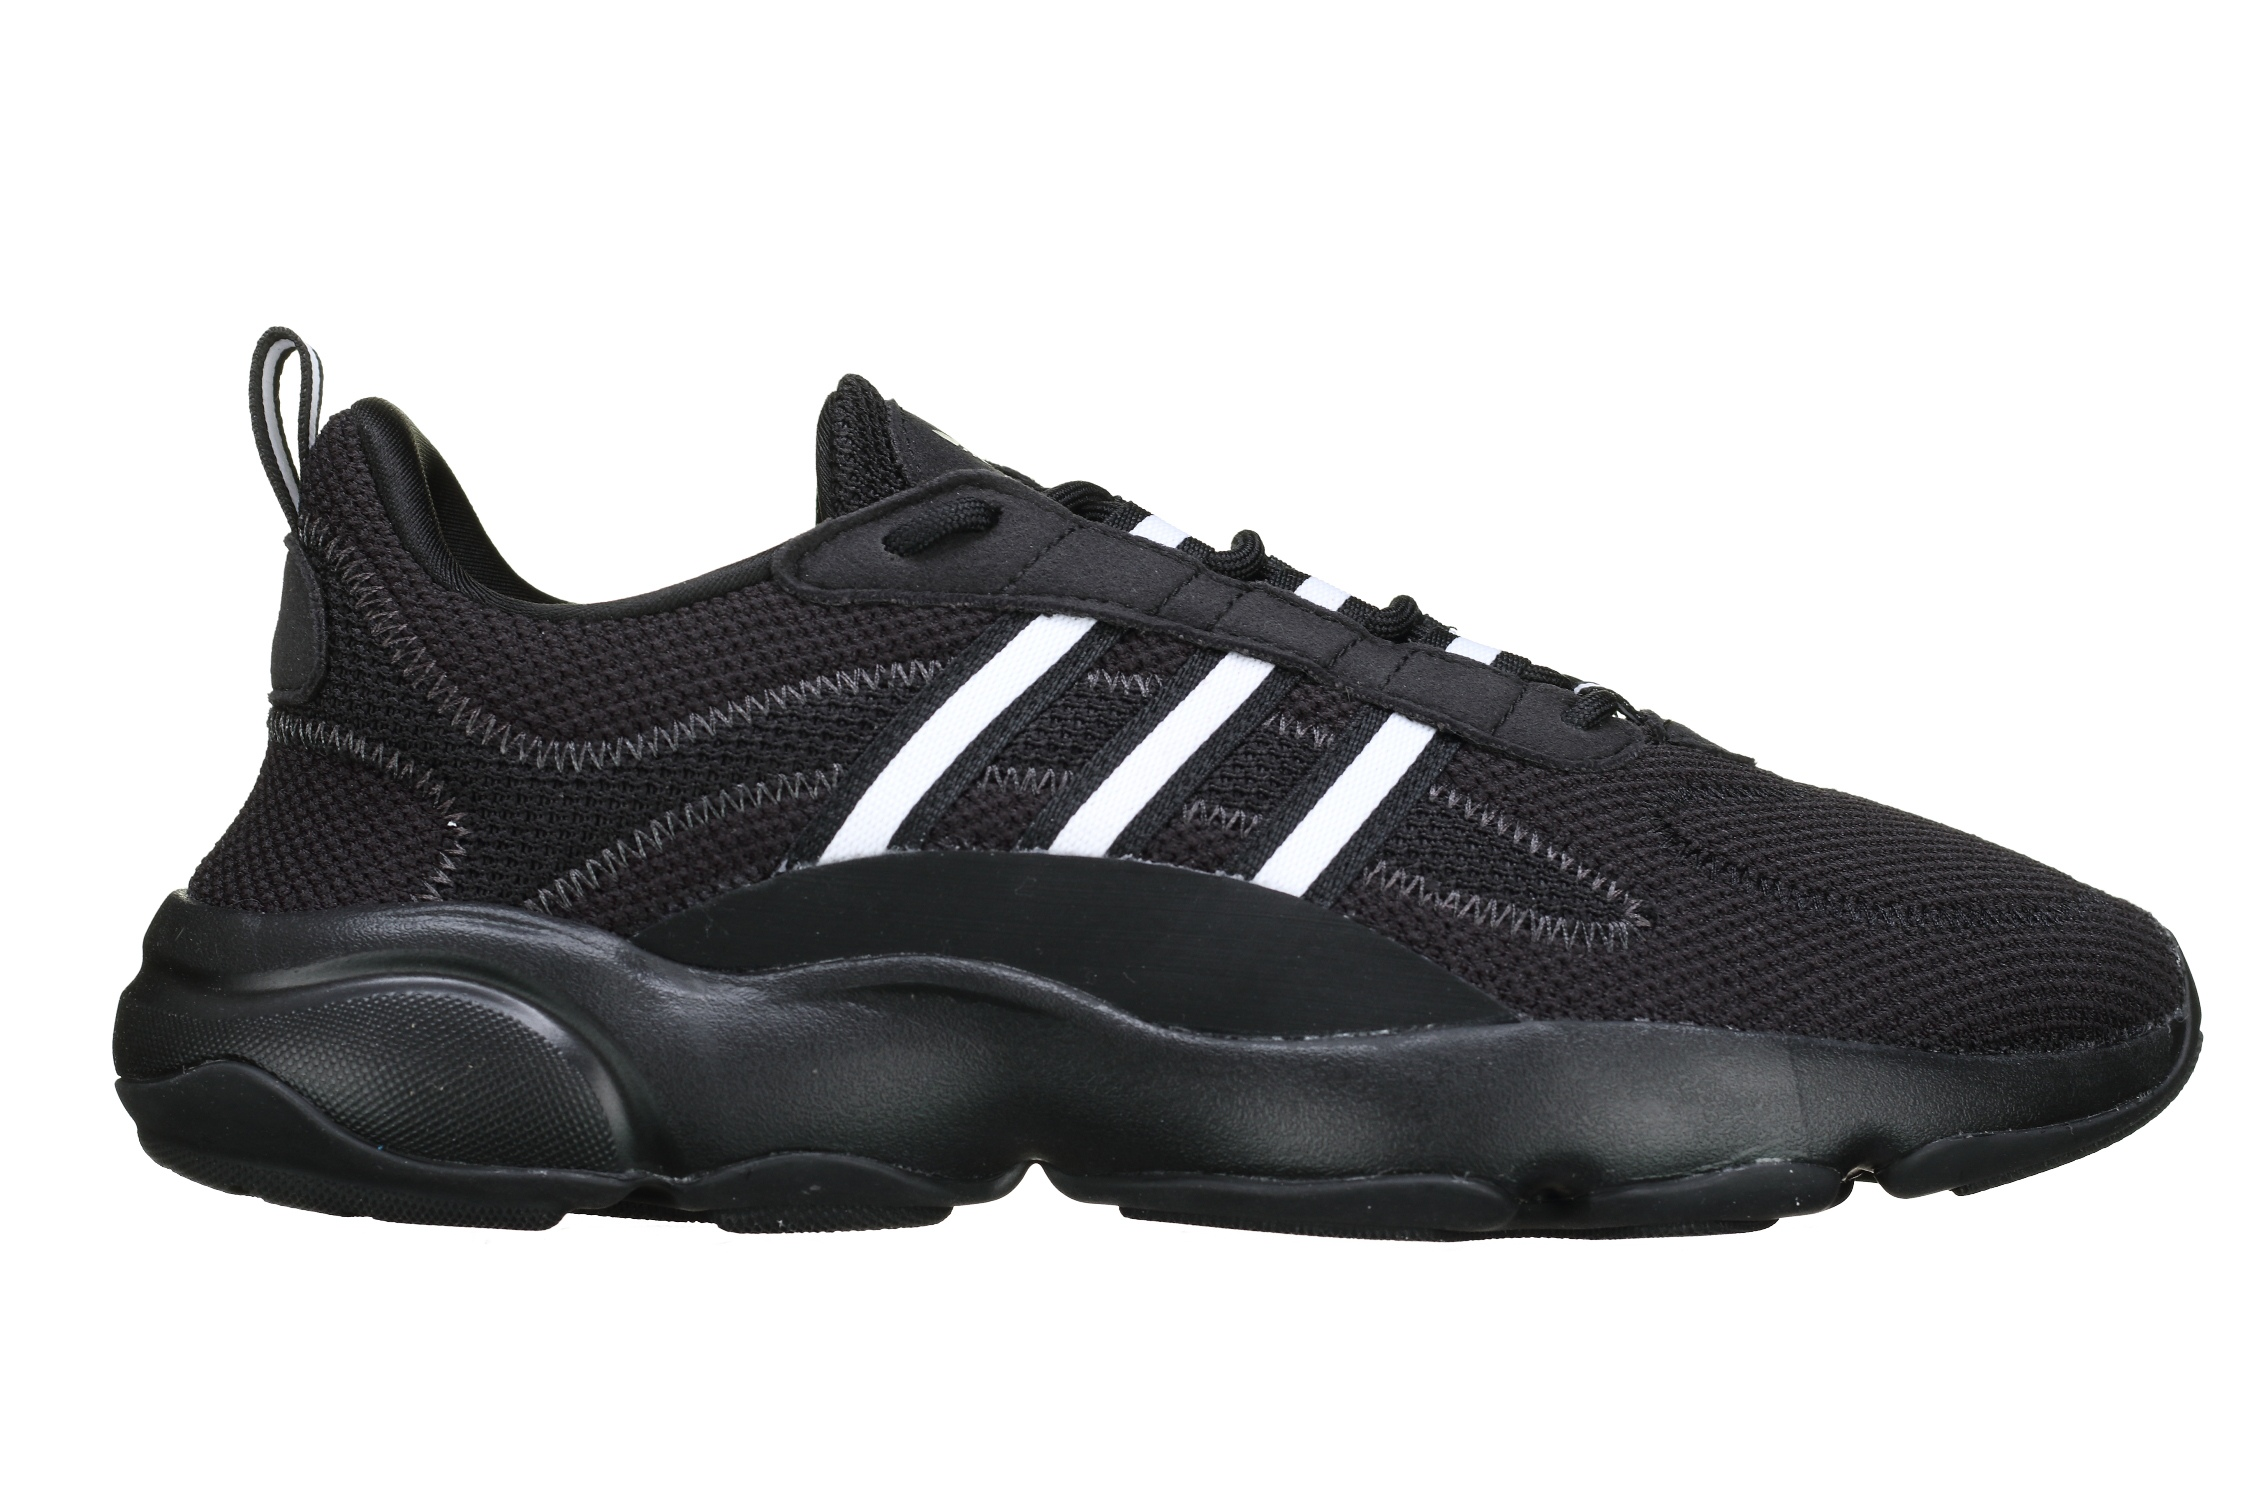 https://www.leadermode.com/185017/adidas-haiwee-eg9575-noir.jpg